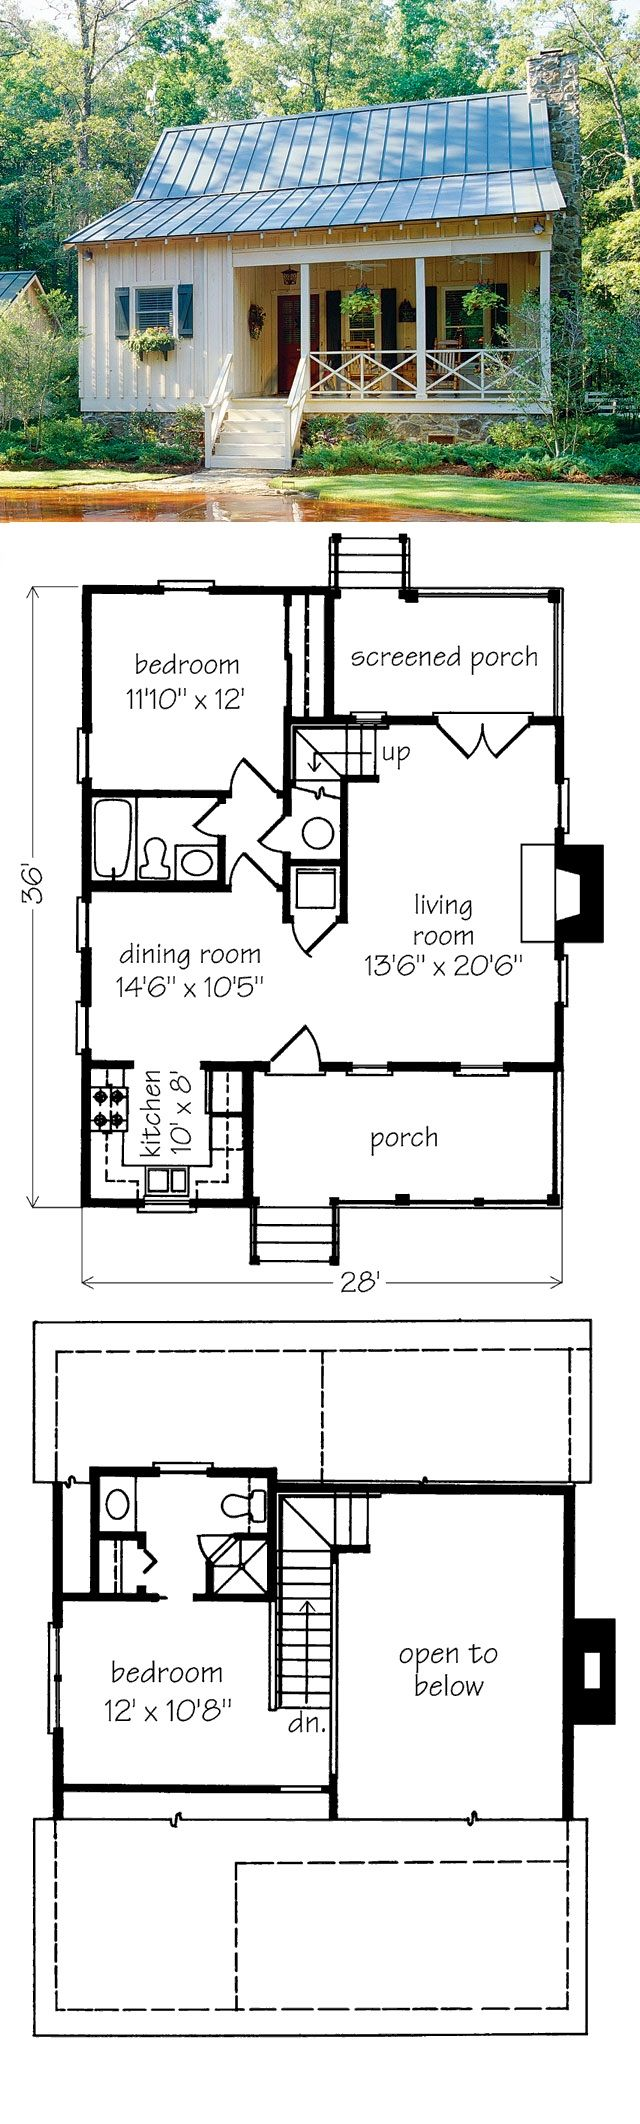 Best House Plans Images On Pinterest Magnolia Homes